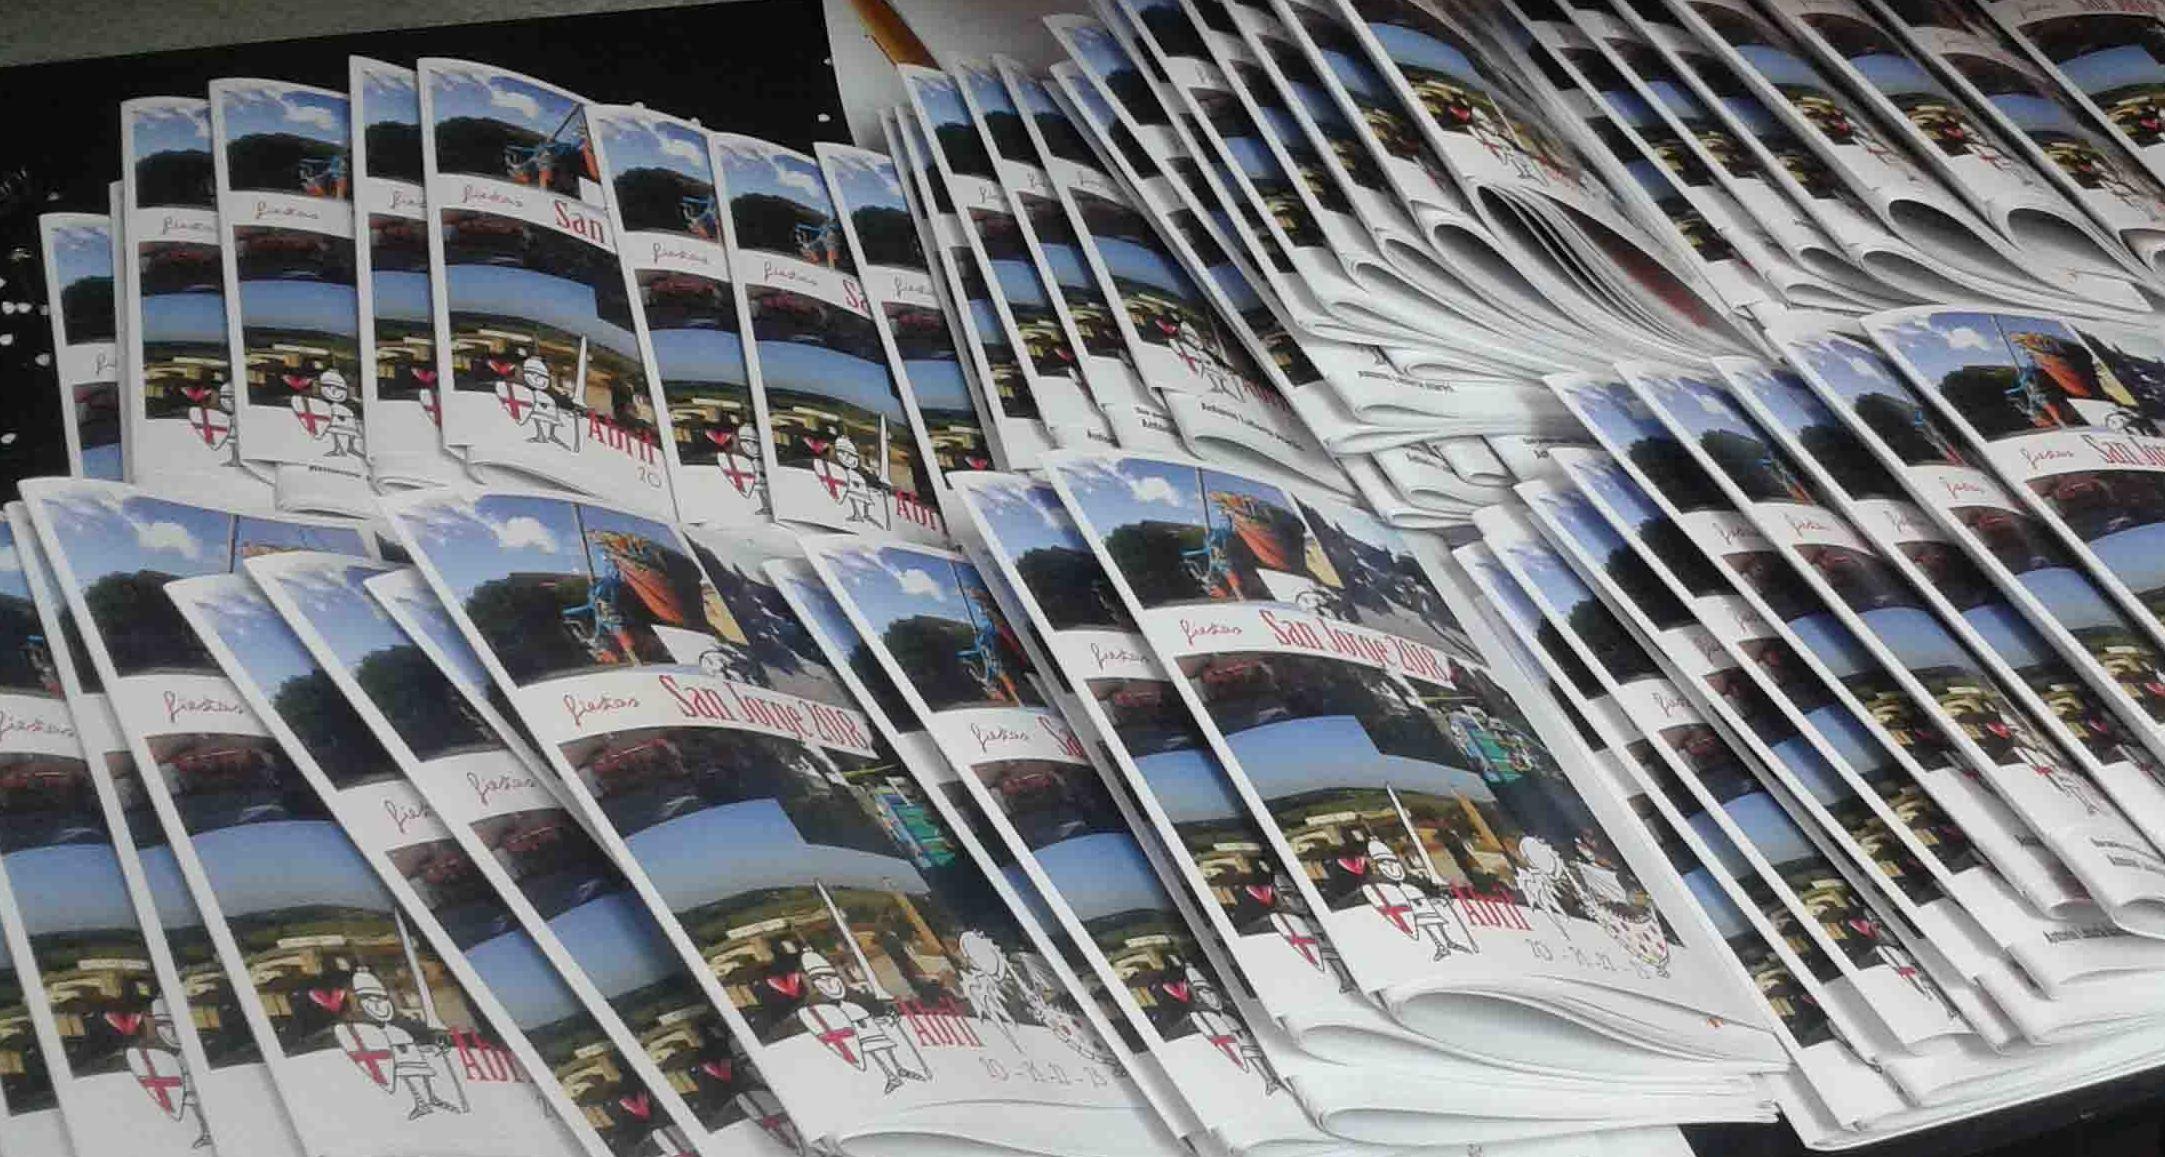 Impresión digital de programas de fiestas en Zaragoza